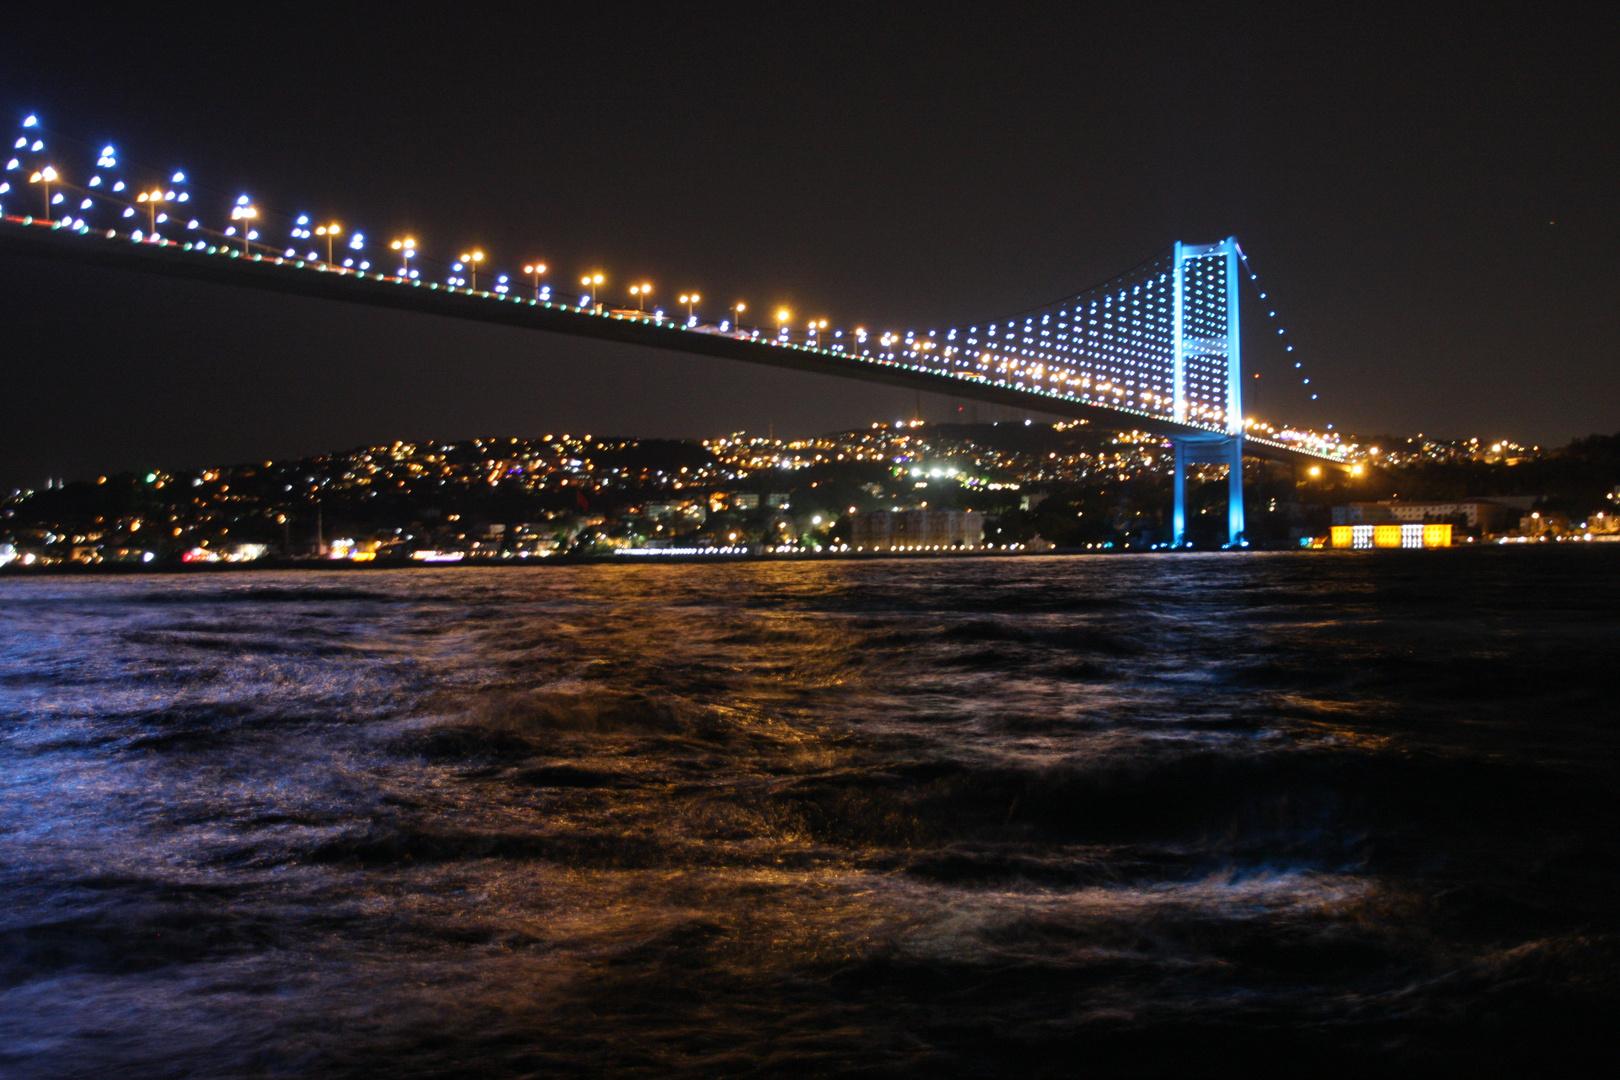 Nachts am Bosporus